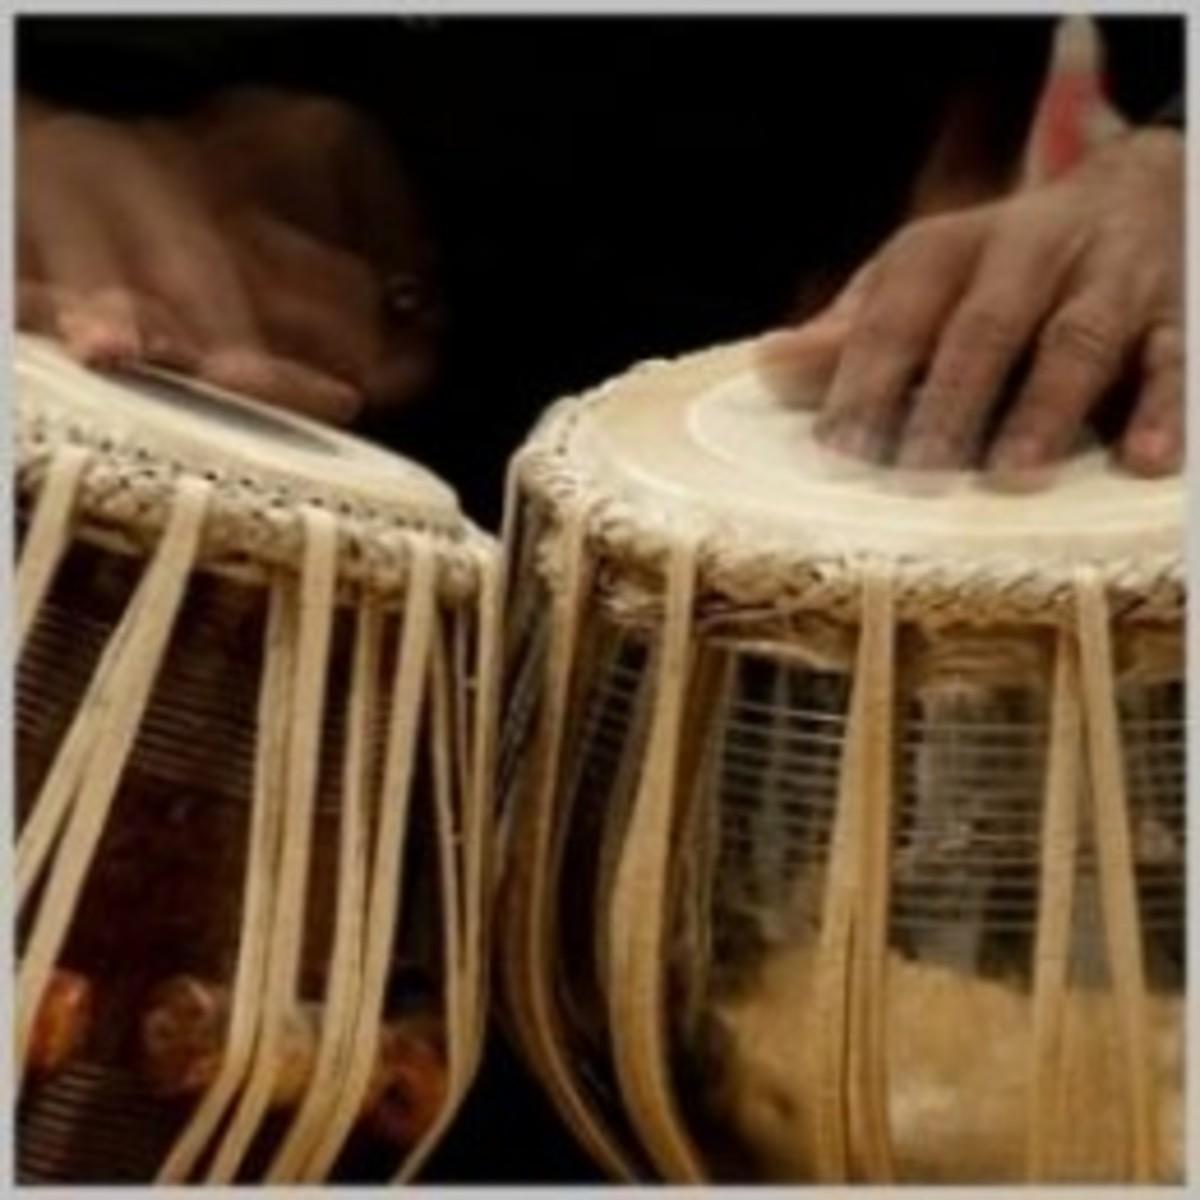 Tabla - Folk Musical Instrument